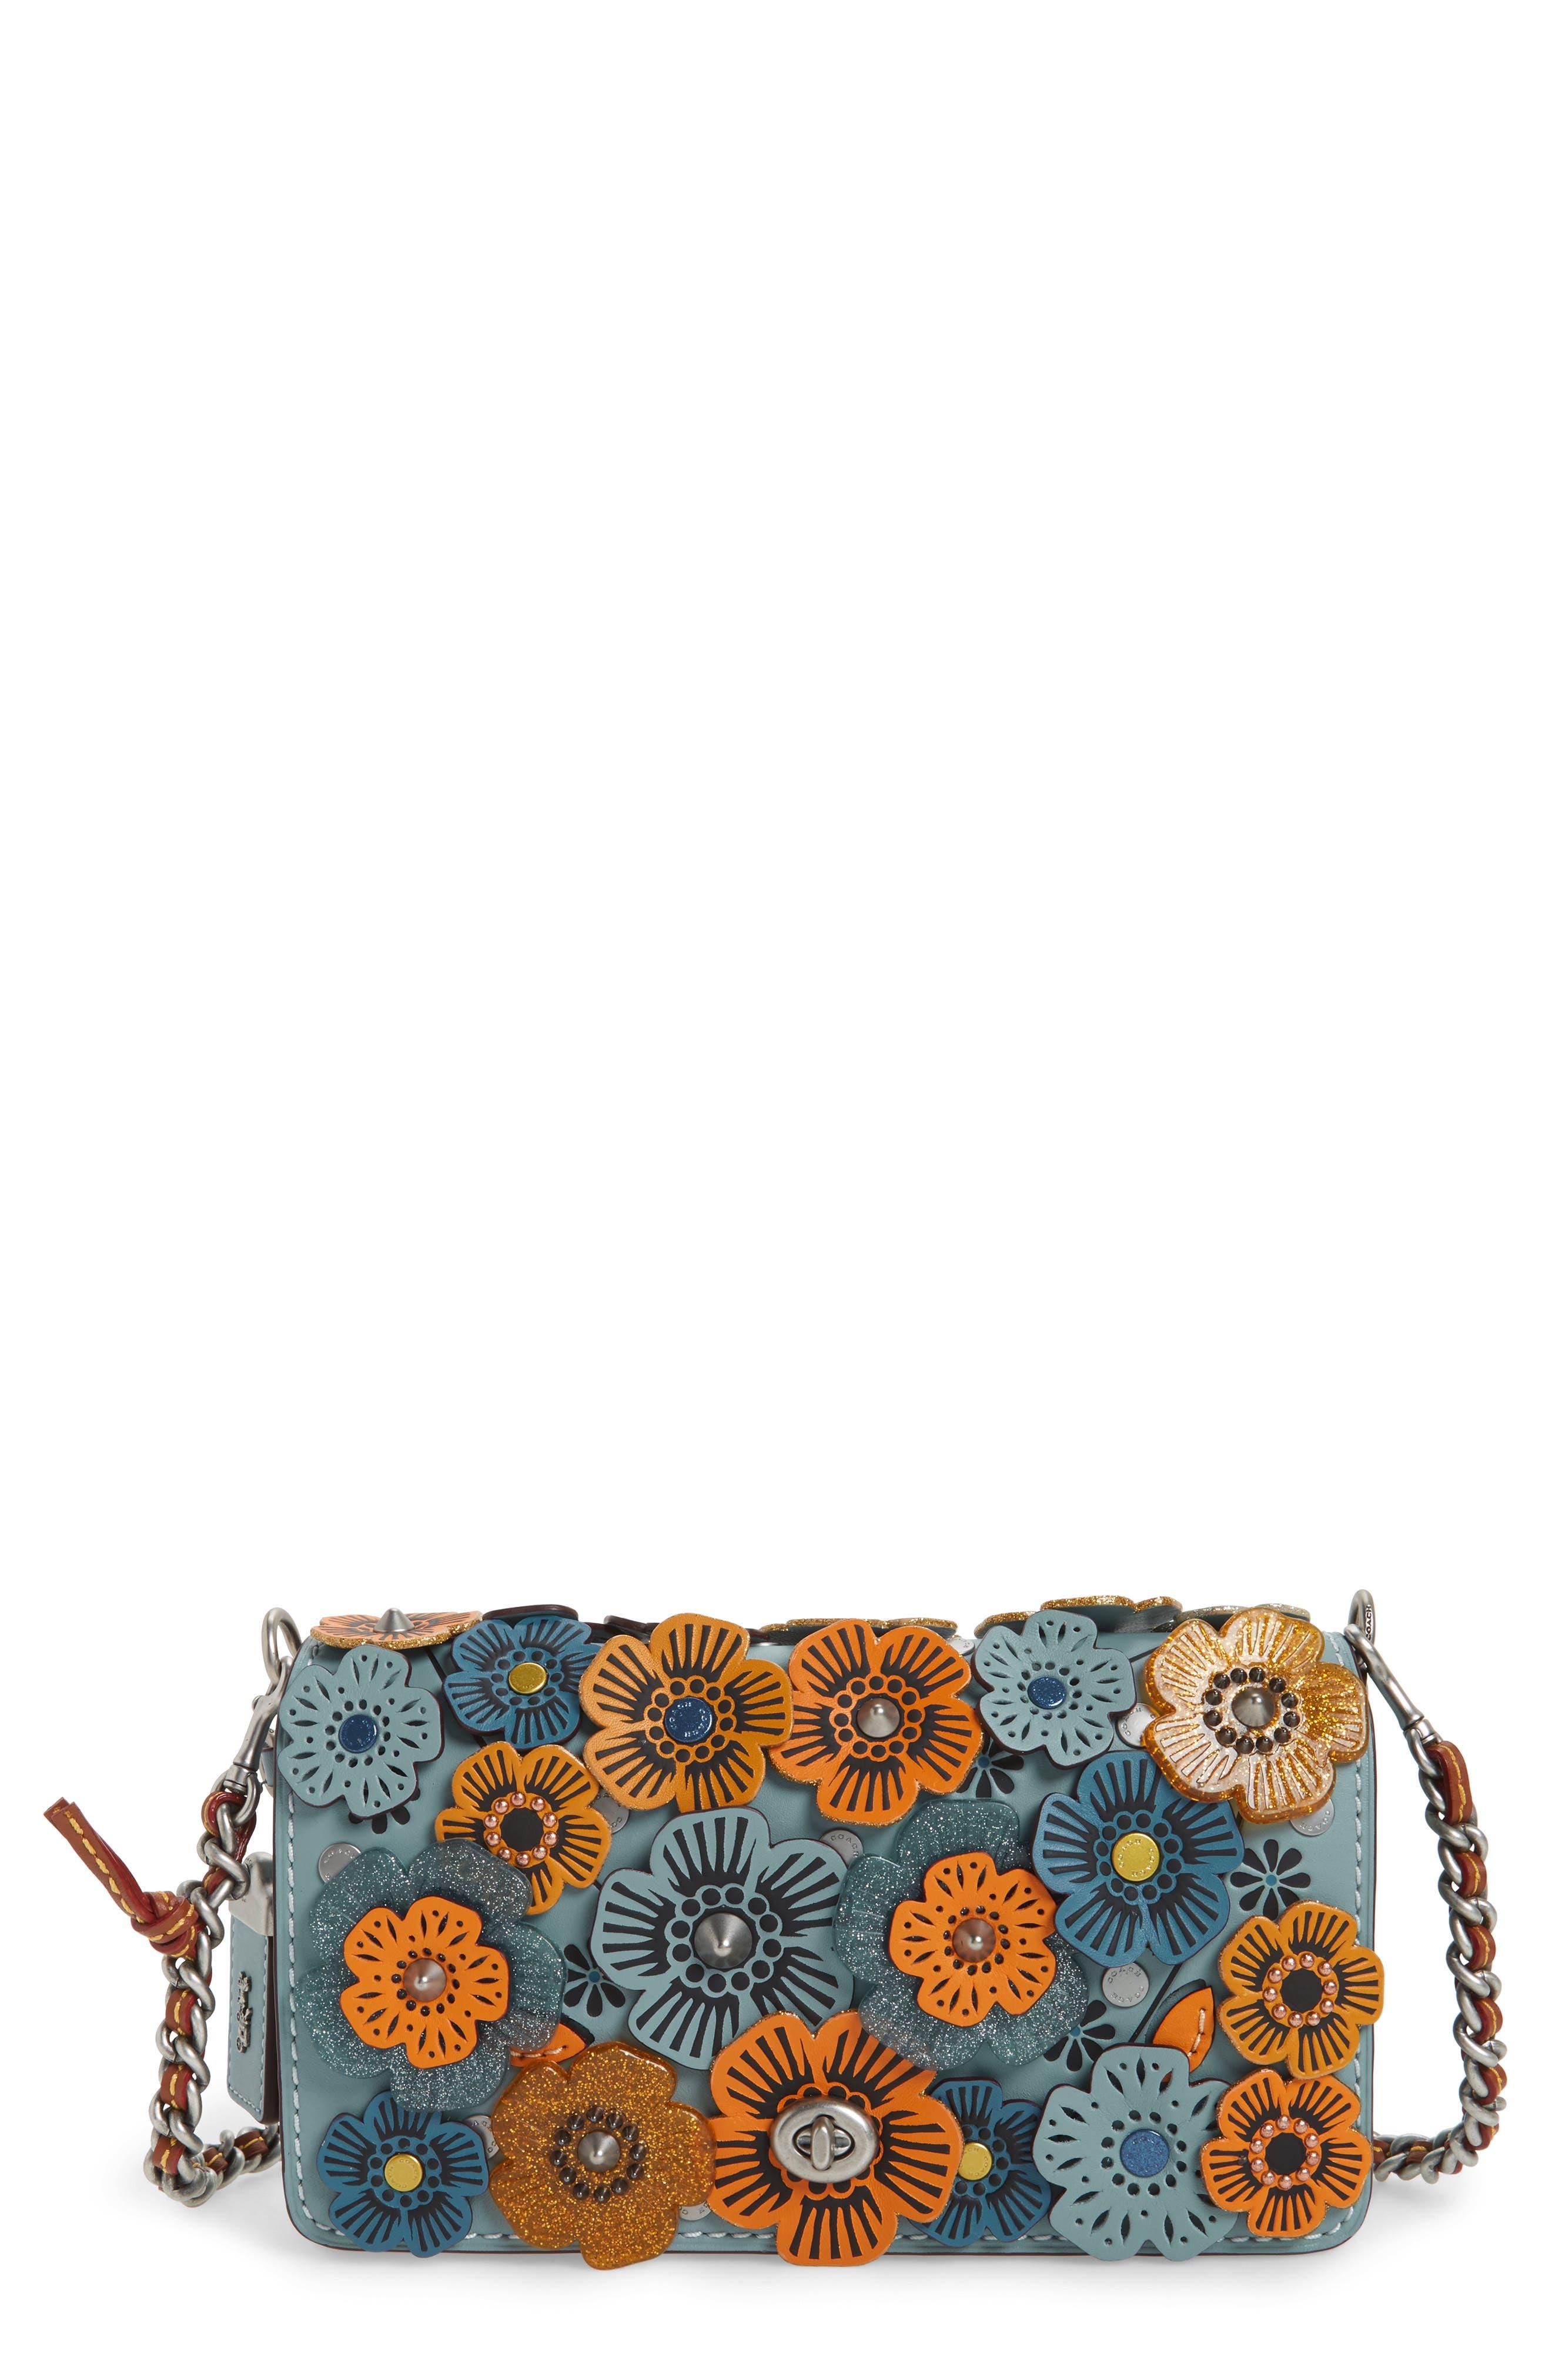 Alternate Image 1 Selected - COACH 1941 Dinky Tea Rose Appliqué Leather Crossbody Bag